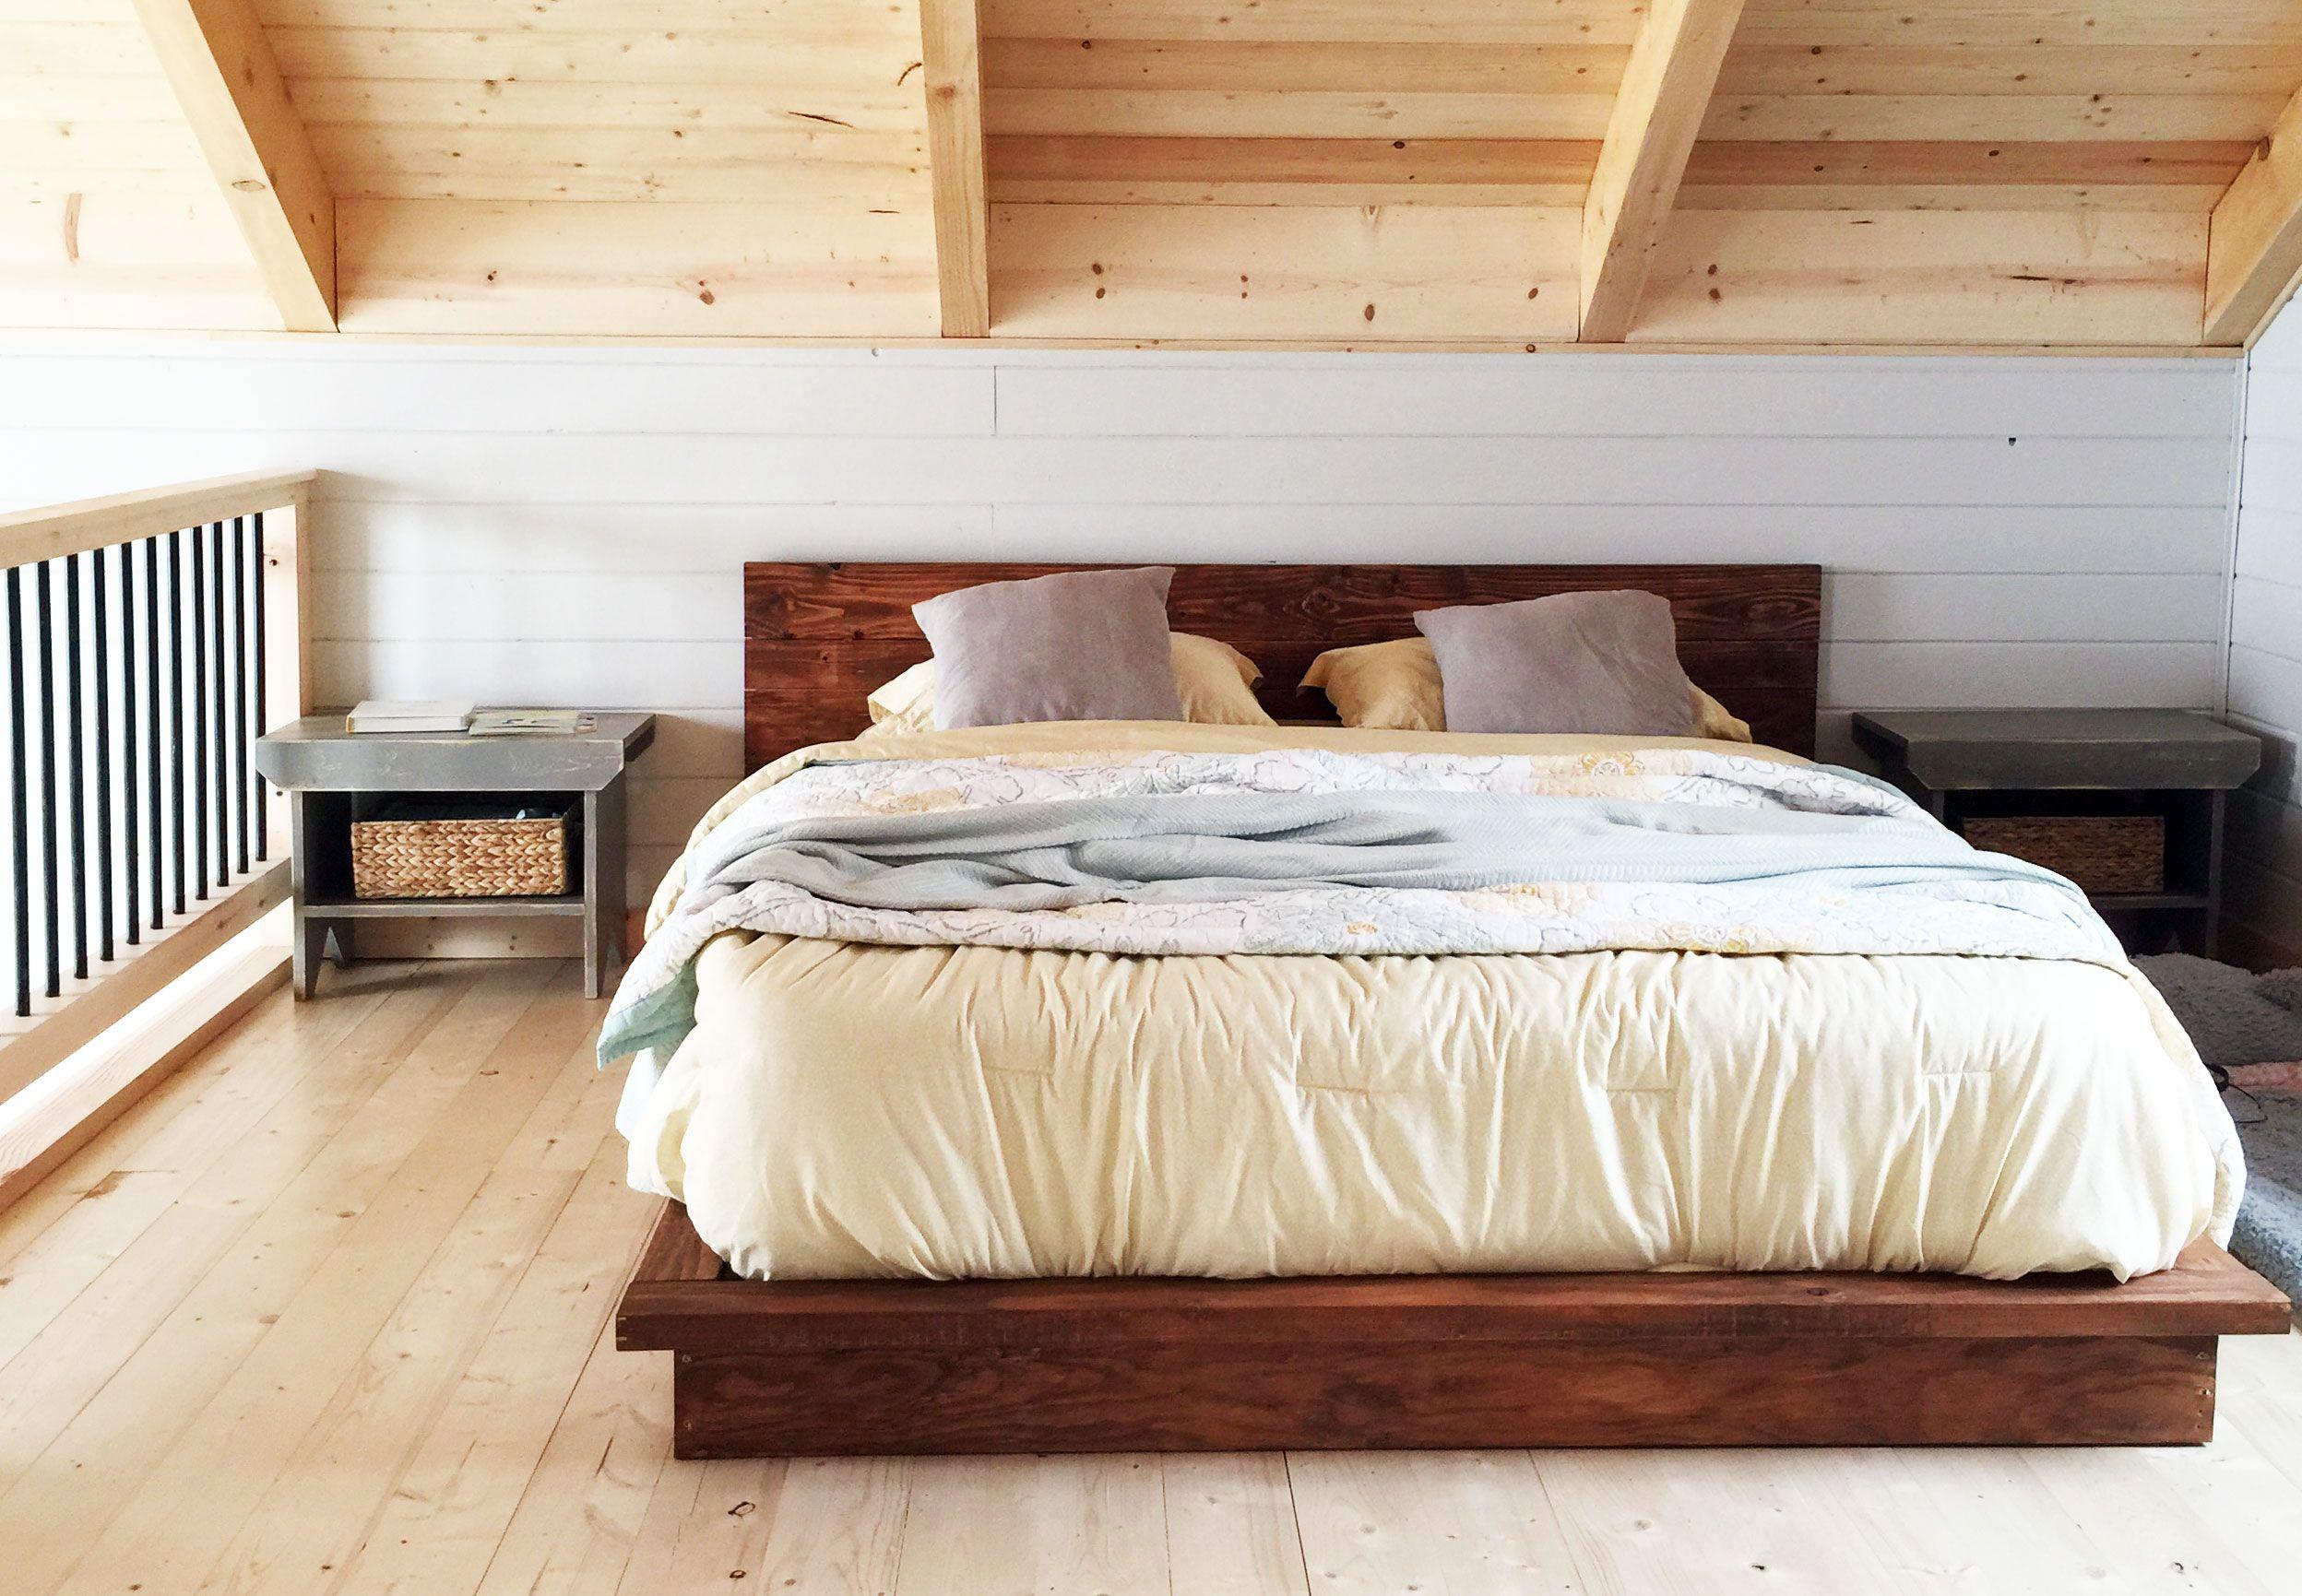 Rustic Modern 2x6 Platform Bed (Ana White) Platform bed